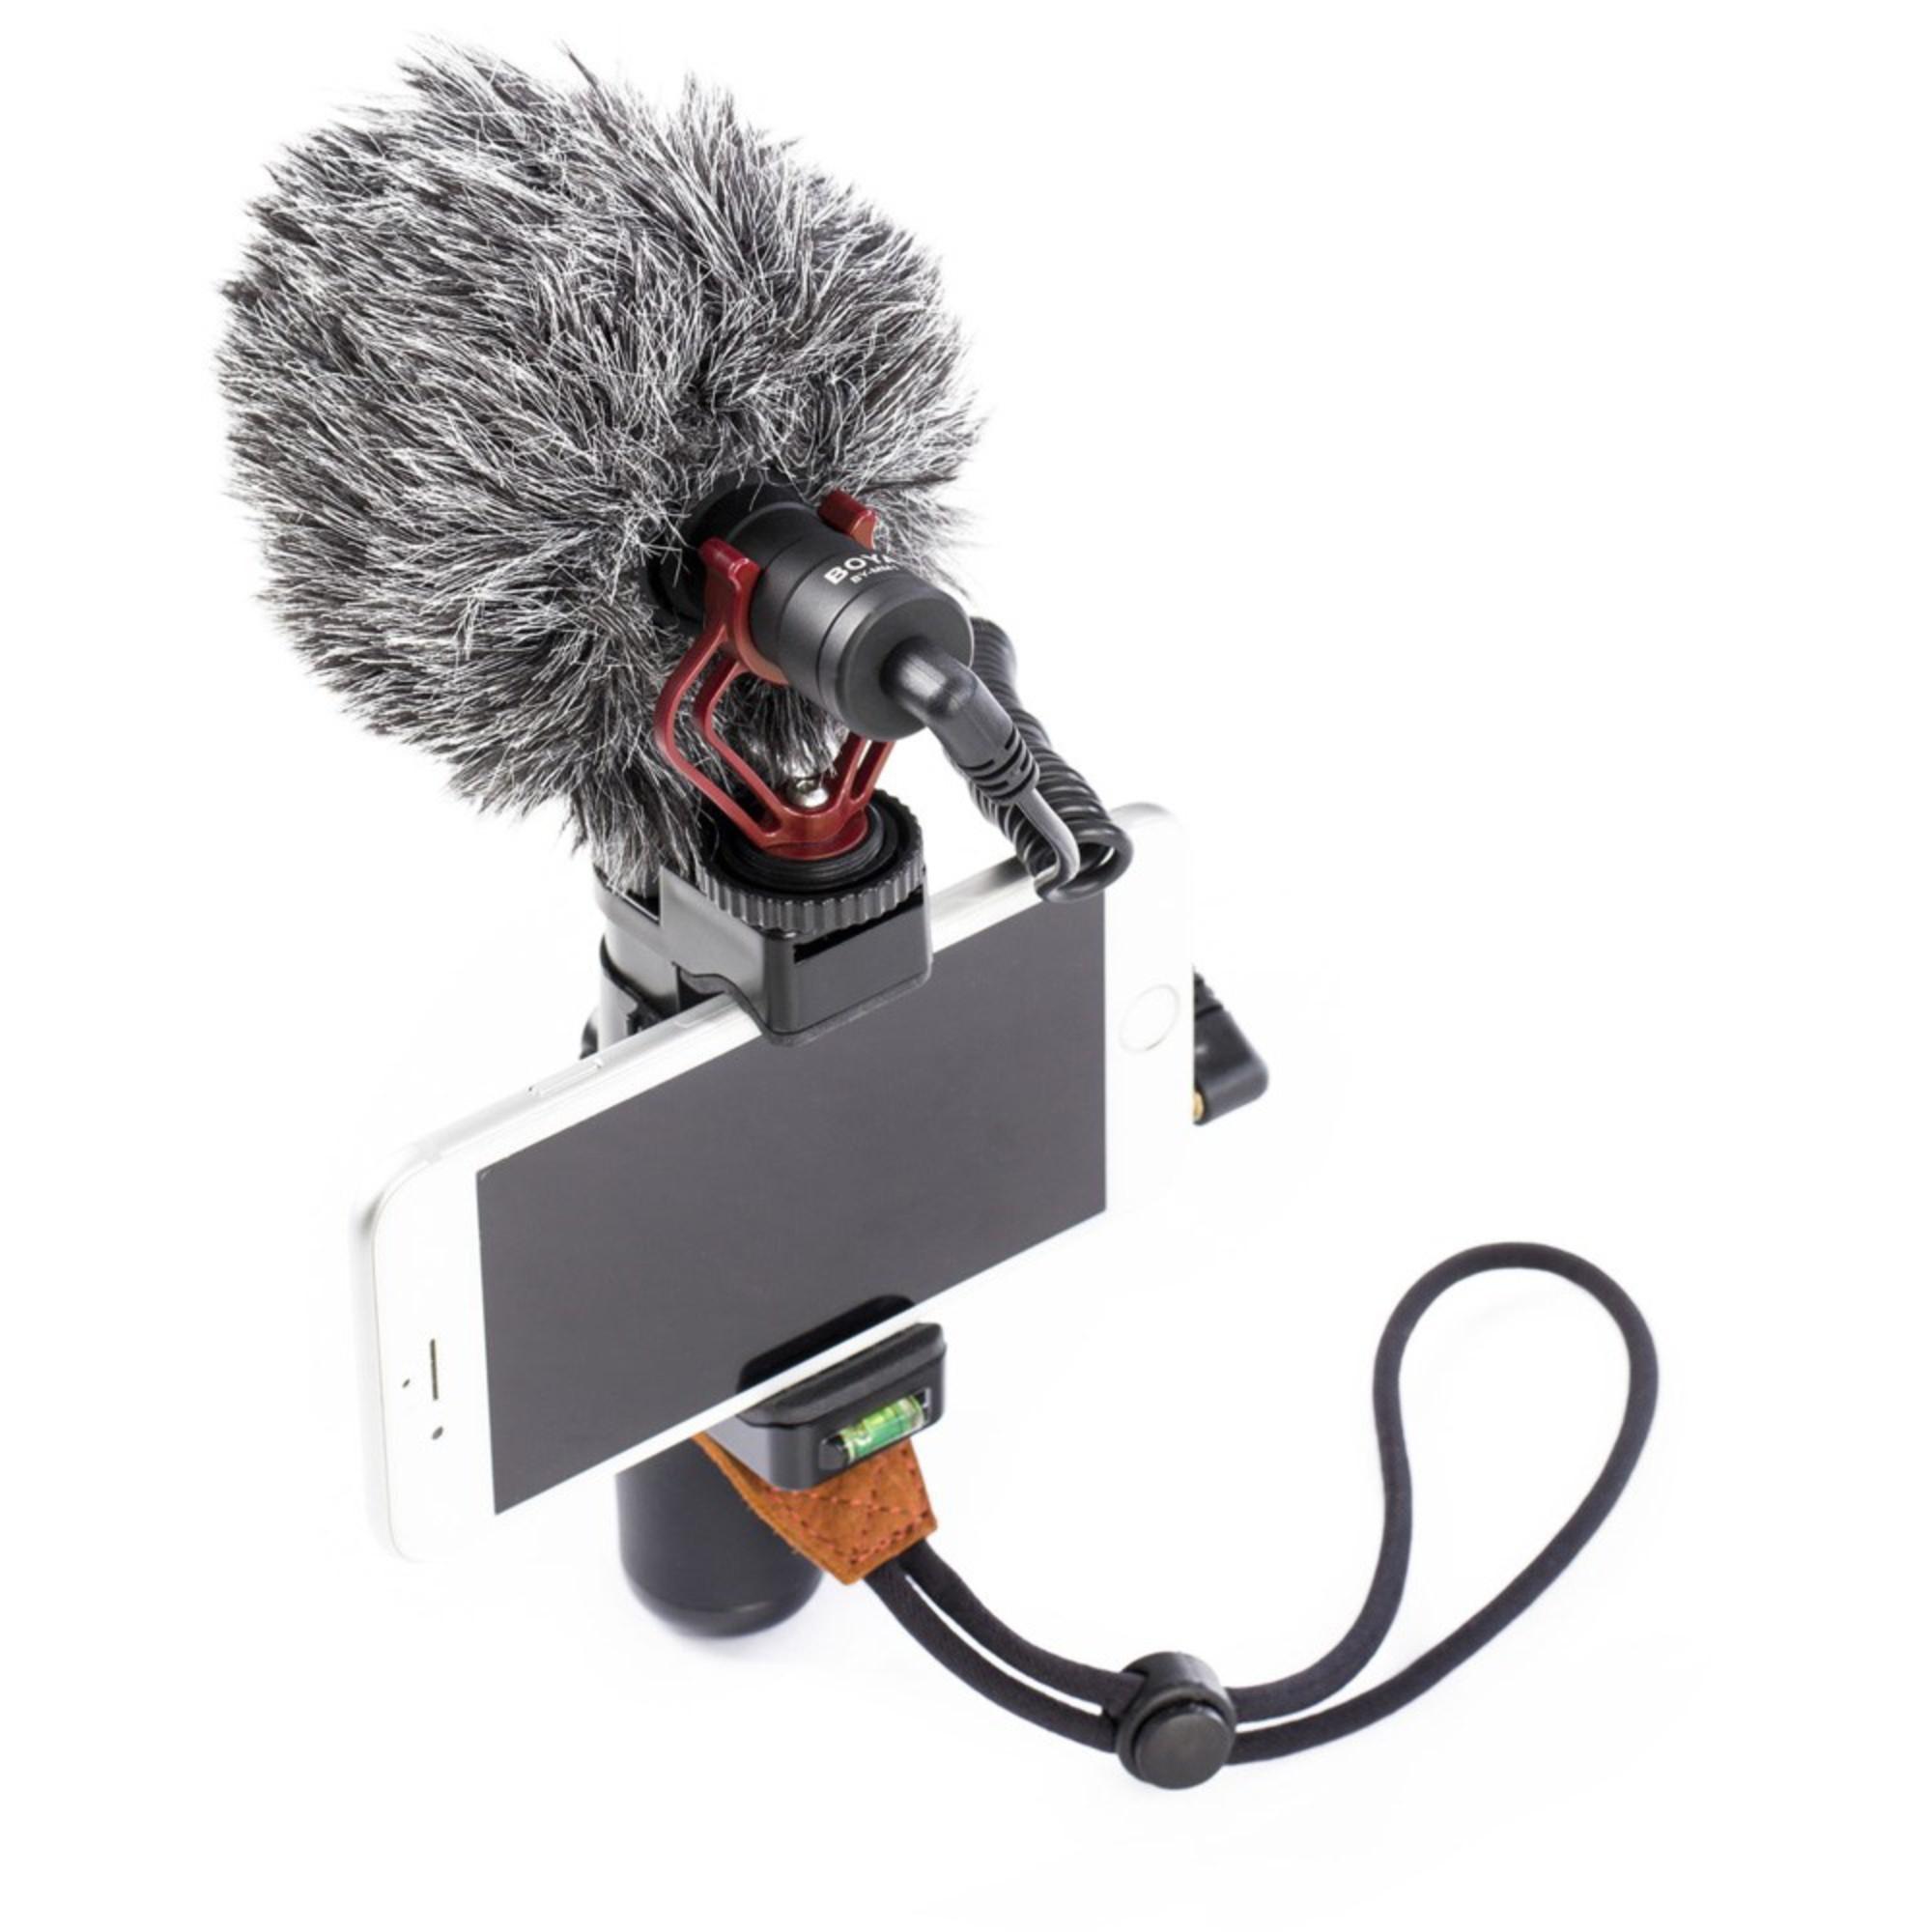 Microfone Boya BY-MM1 Cardioide Direcional Preto